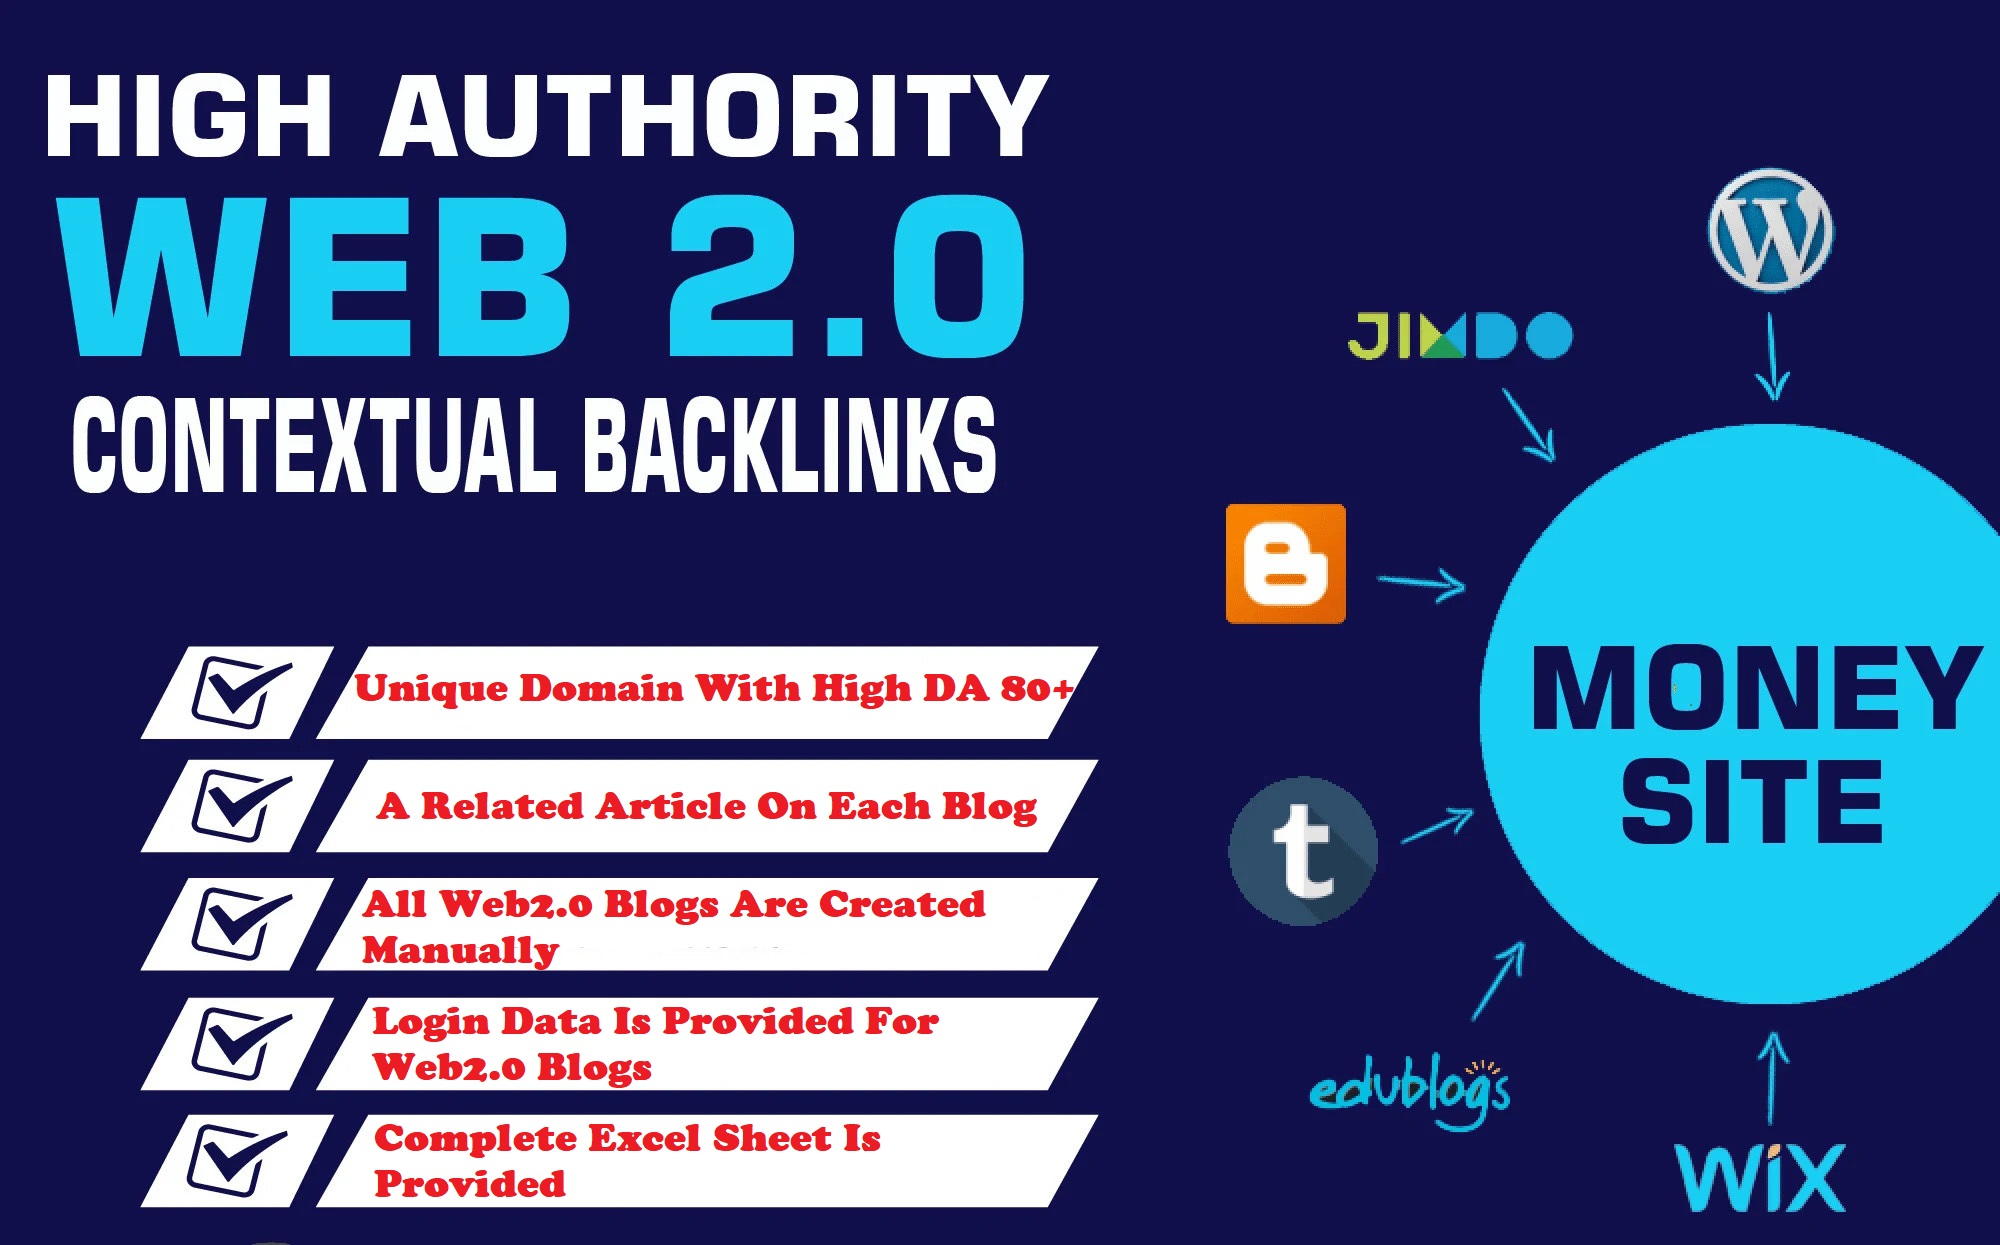 I Will Build 20 Contextual Web2.0 High Quality SEO Dofollow Manual Backlinks